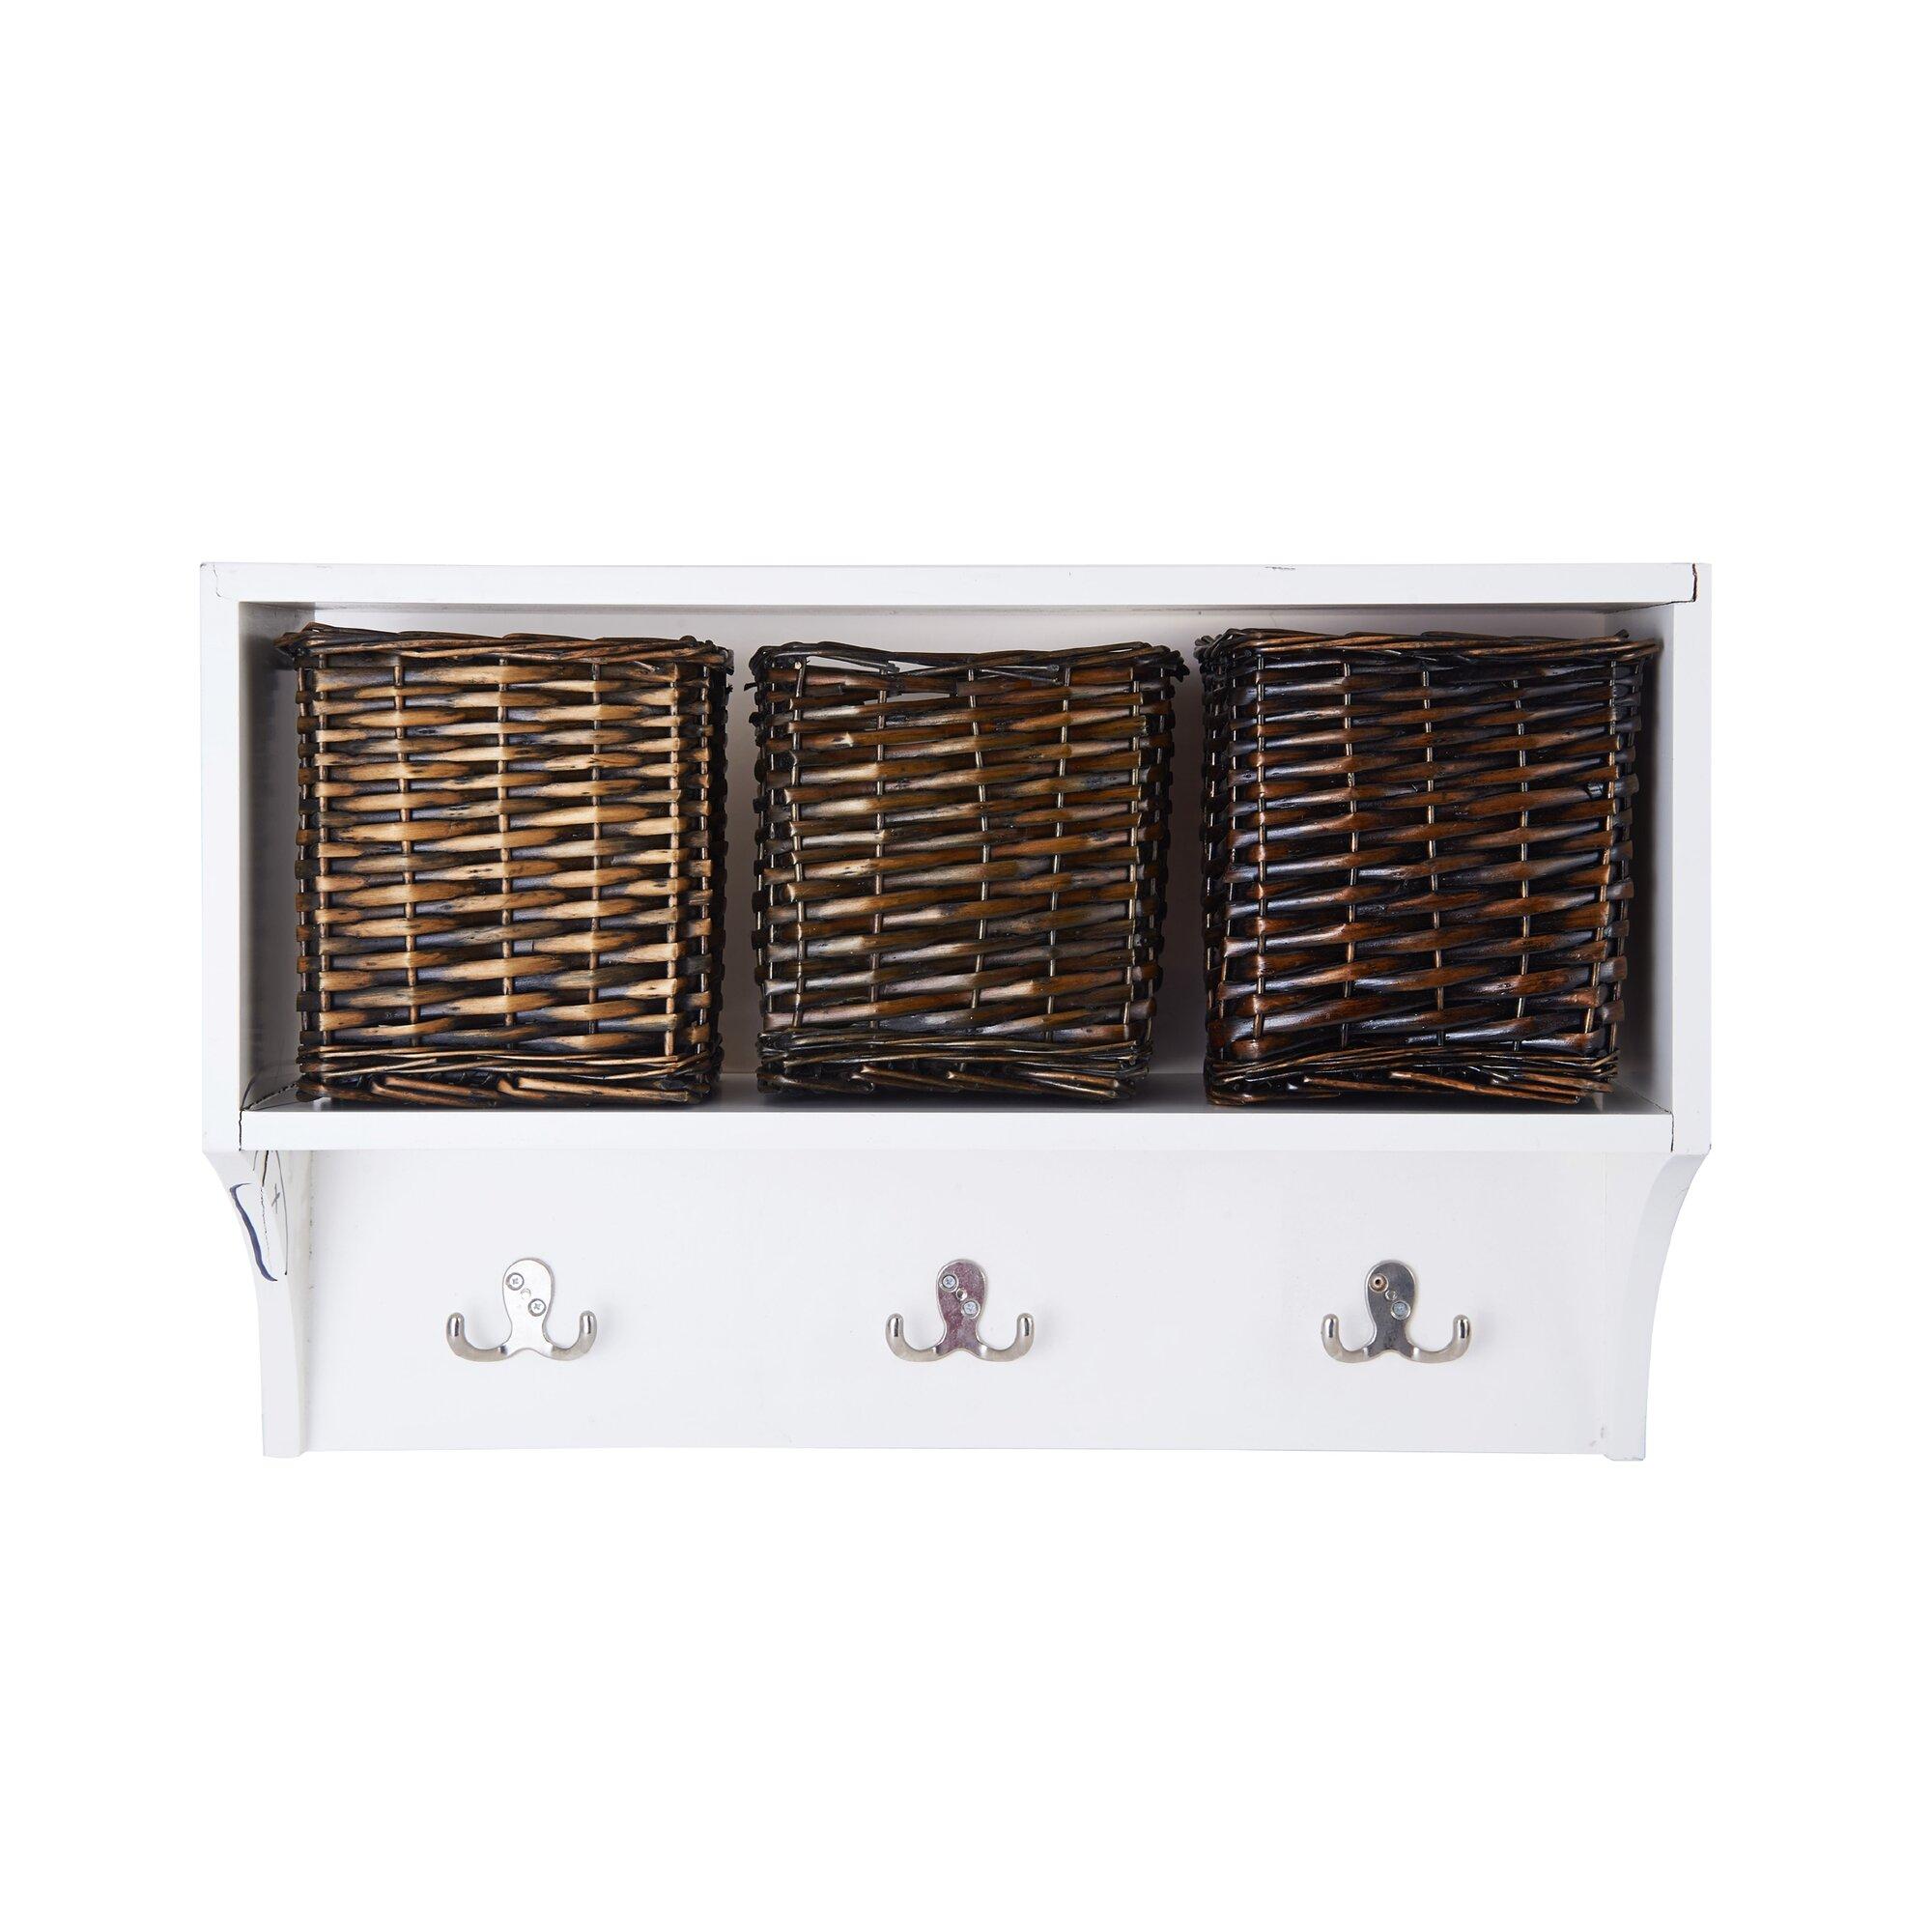 Melannco 3 Basket Wall Storage Coat Rack &amp Reviews Wayfair - Kitchen Cabinet Discounts